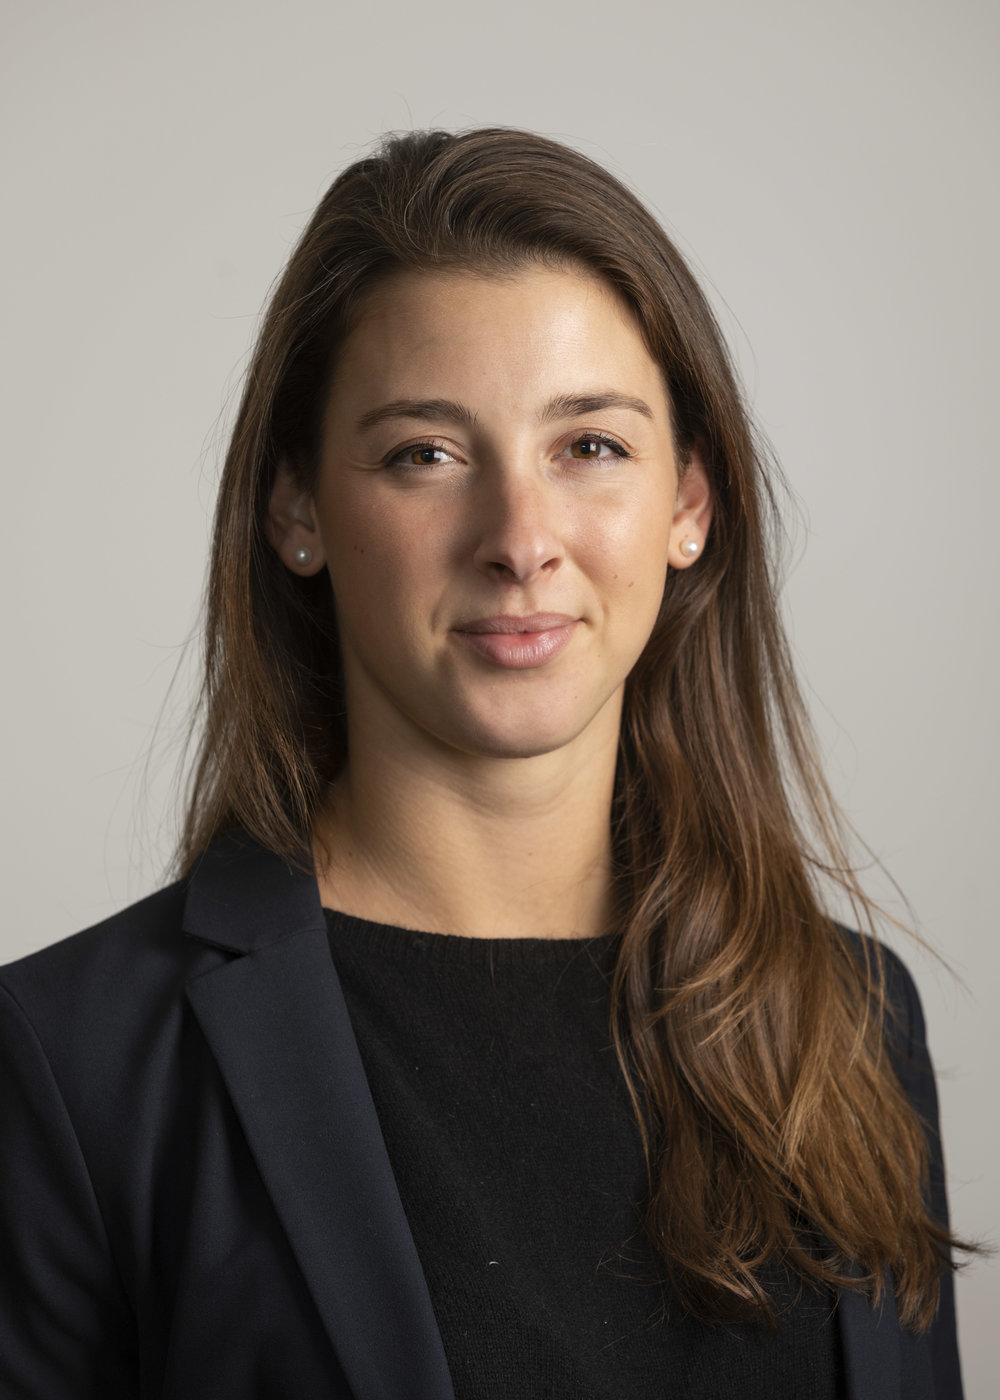 Pilar Brito